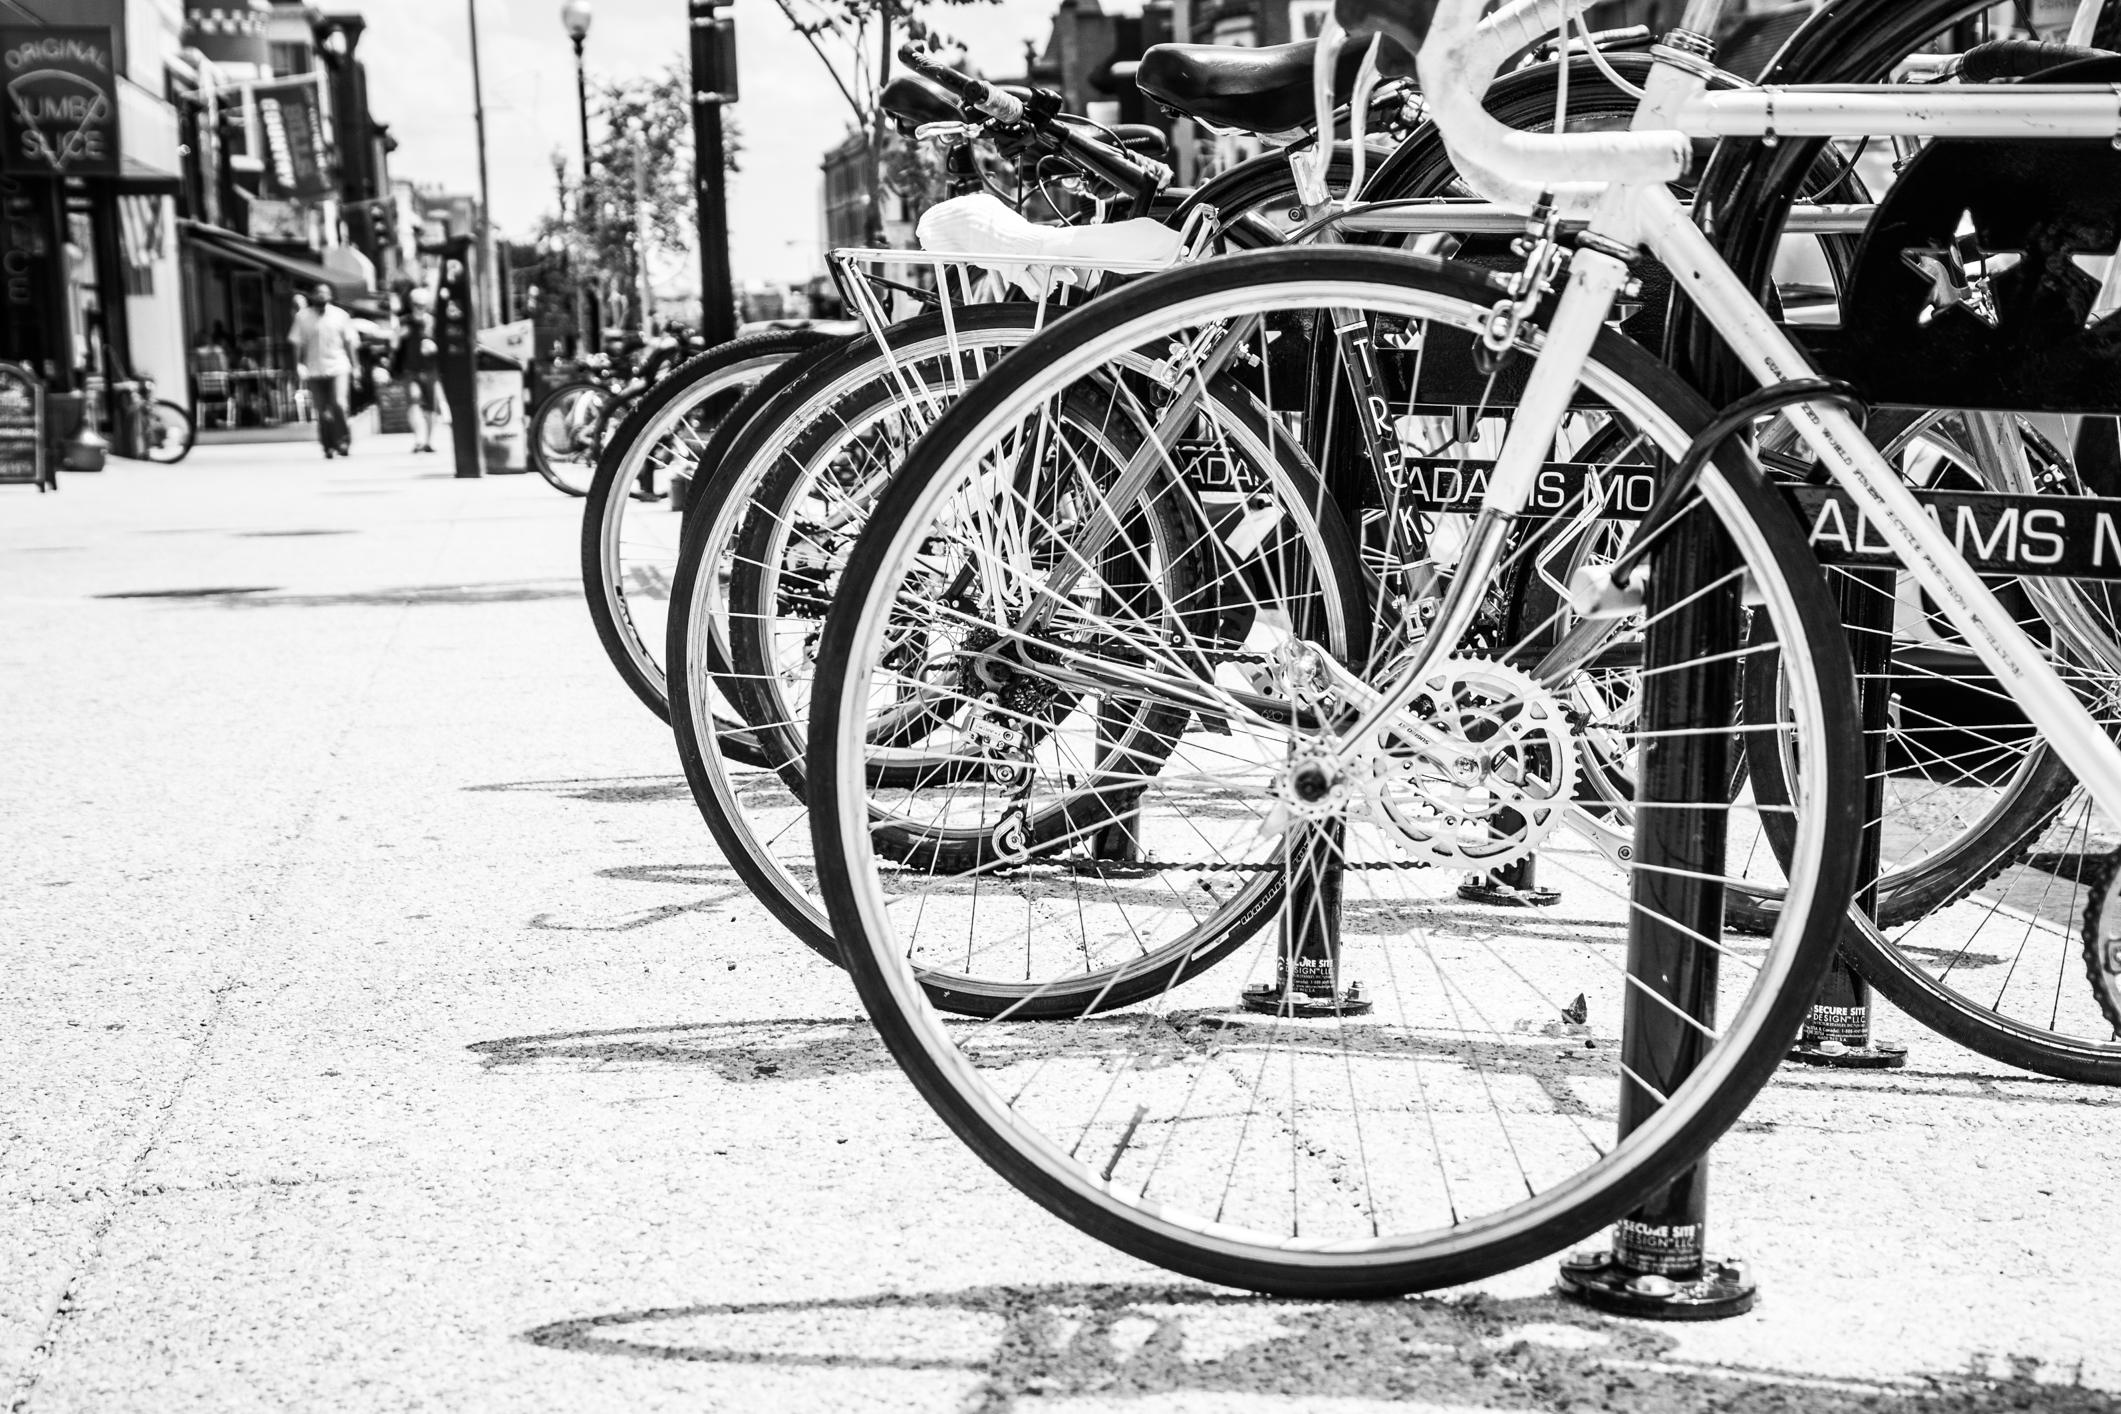 Bikes and pedestrians fill the sidewalks of Adams Morgan in Washington D.C. Not So SAHM